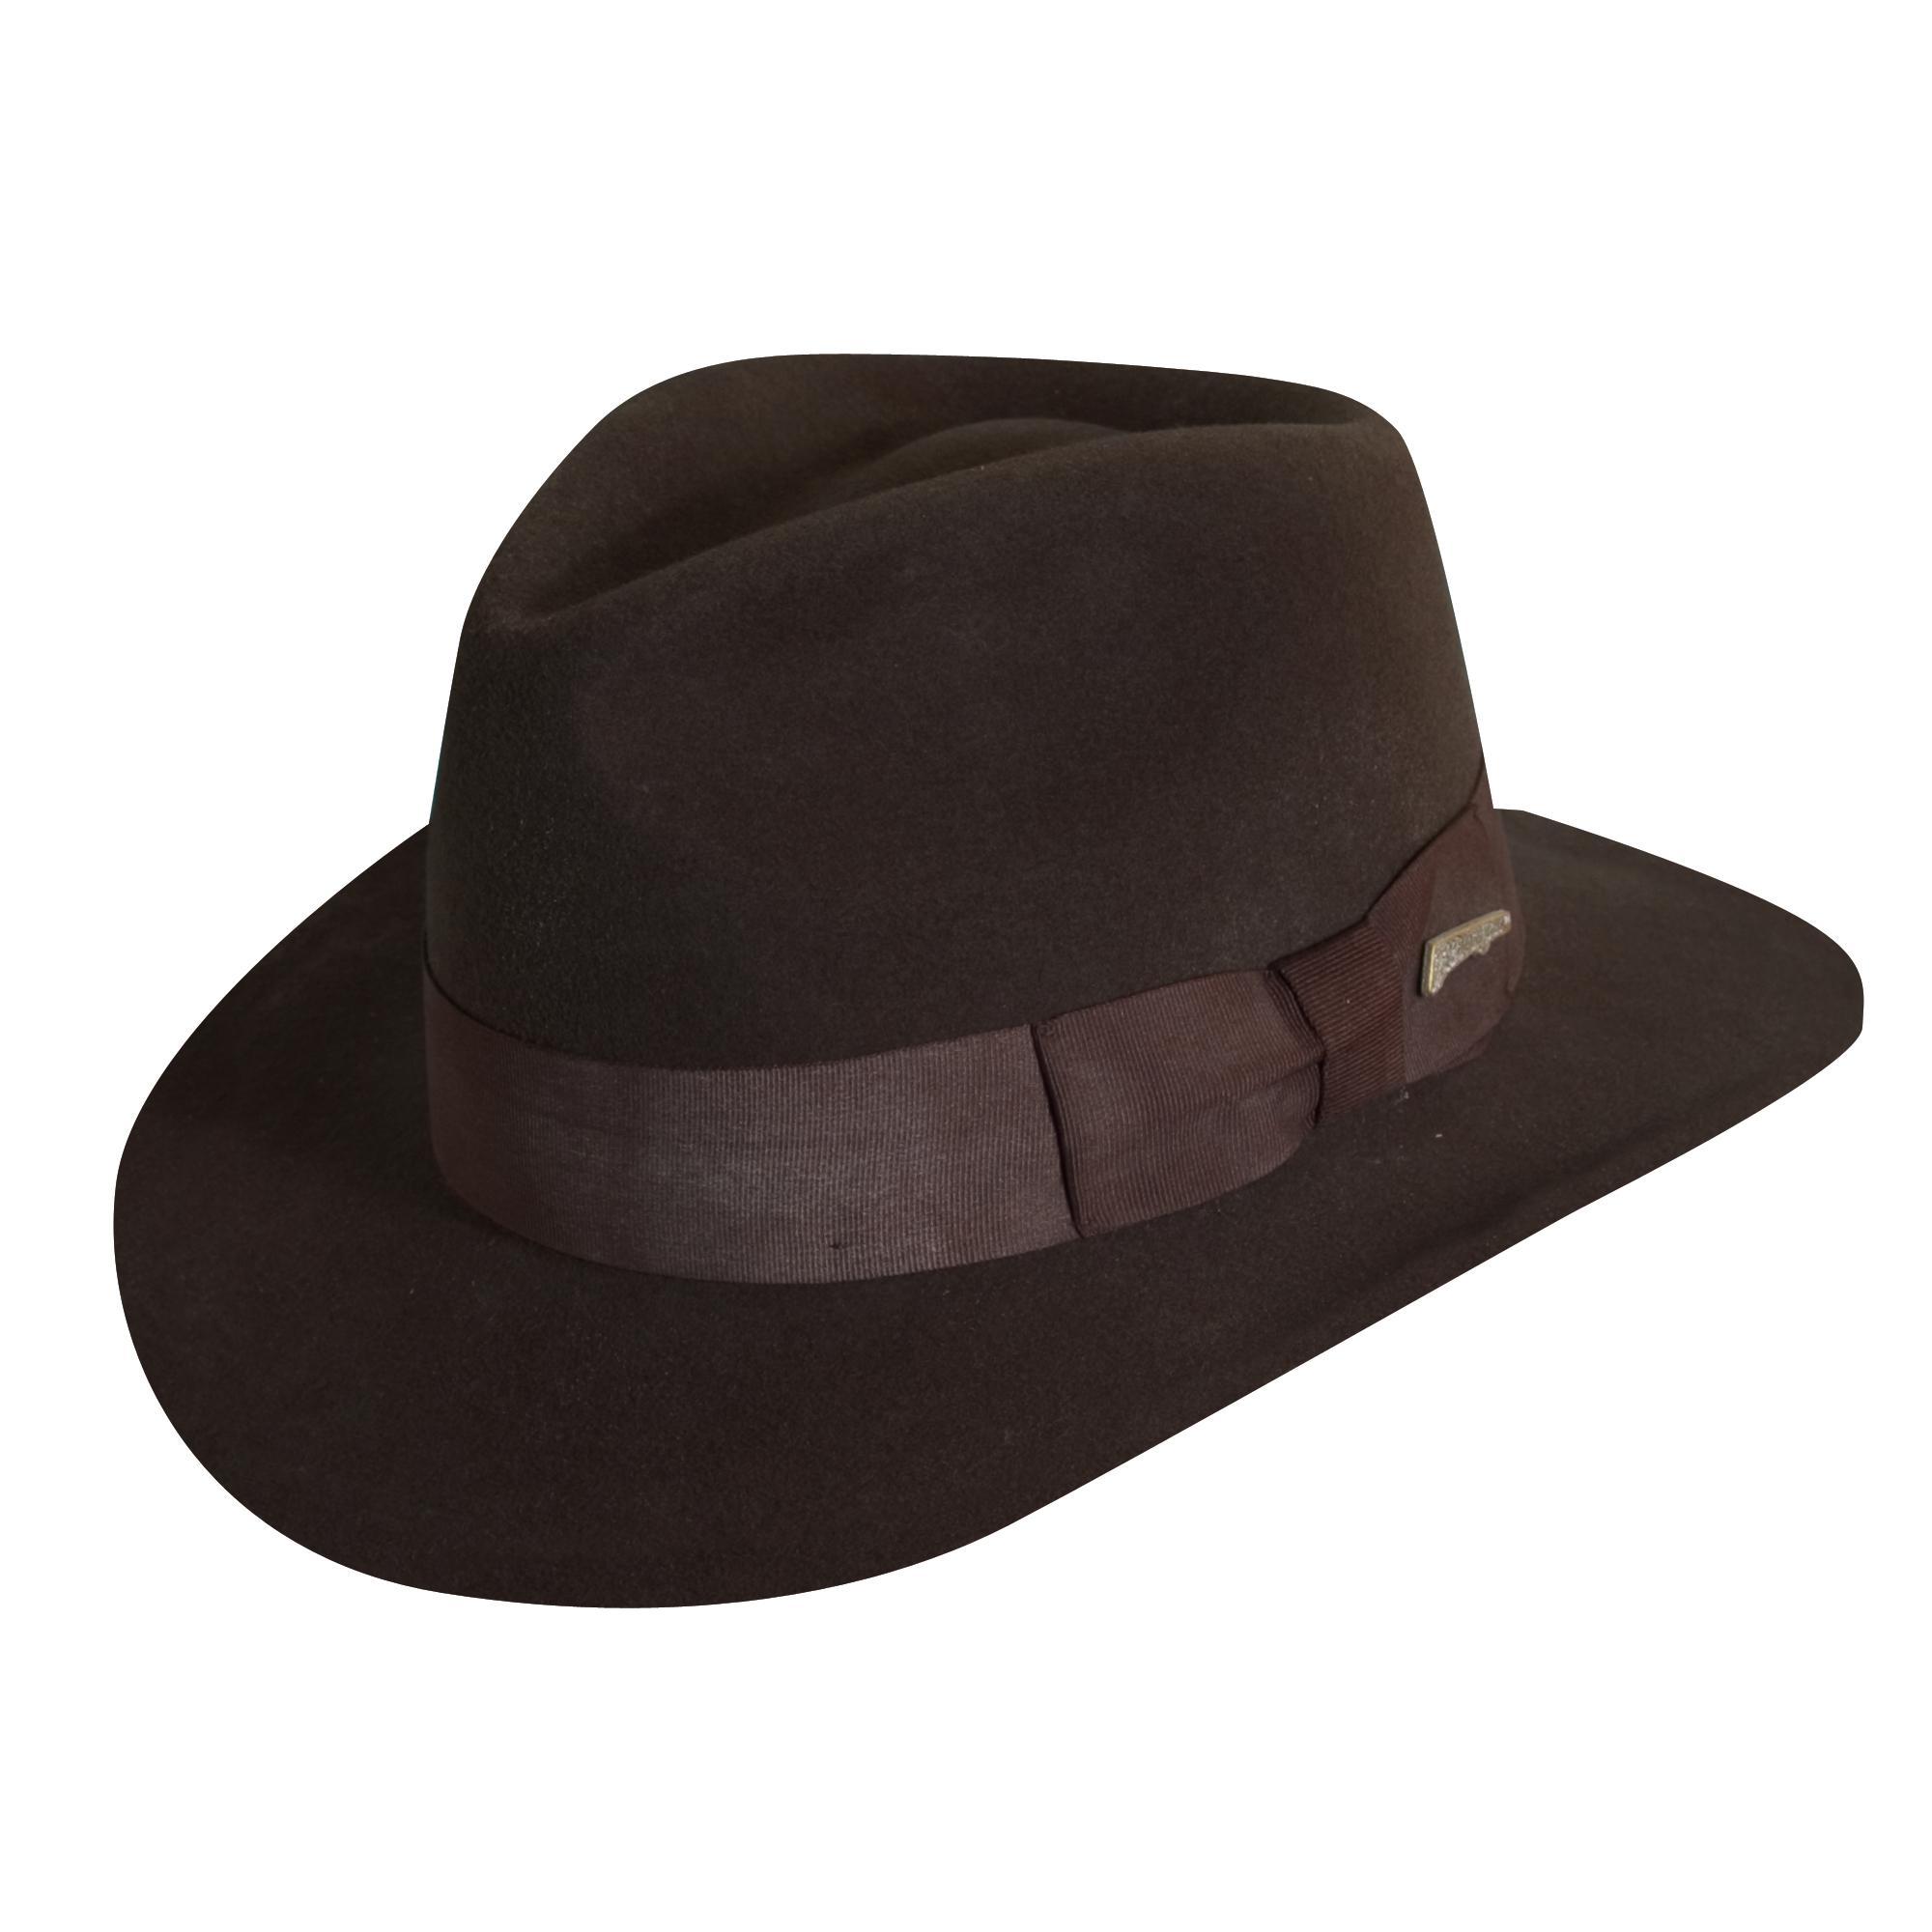 84cb072f666 Dorfman Pacific Indiana Jones Men s Wool Felt 3 Inch Brim Fedora Hat